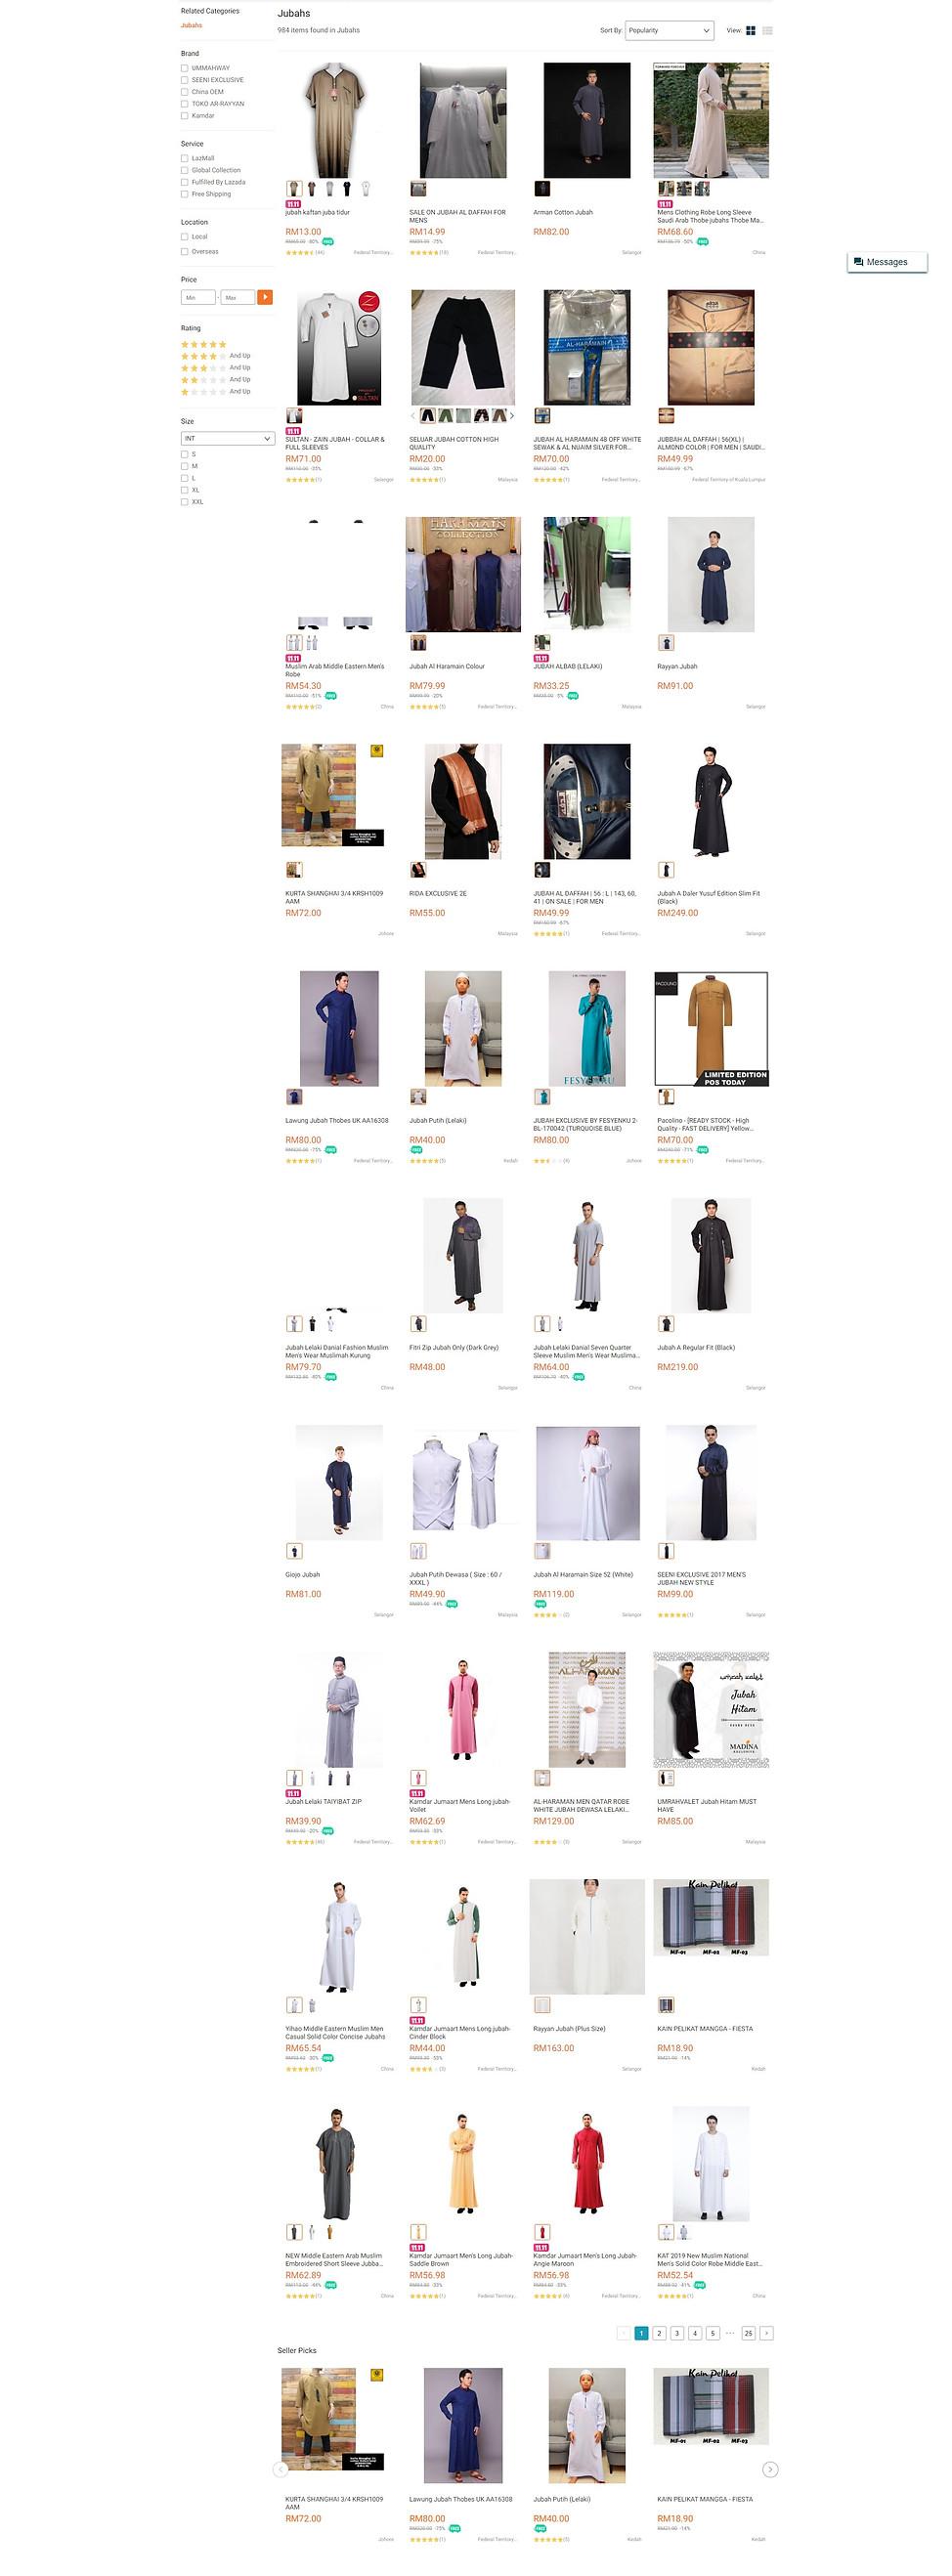 screencapture-lazada-my-shop-men-muslim-